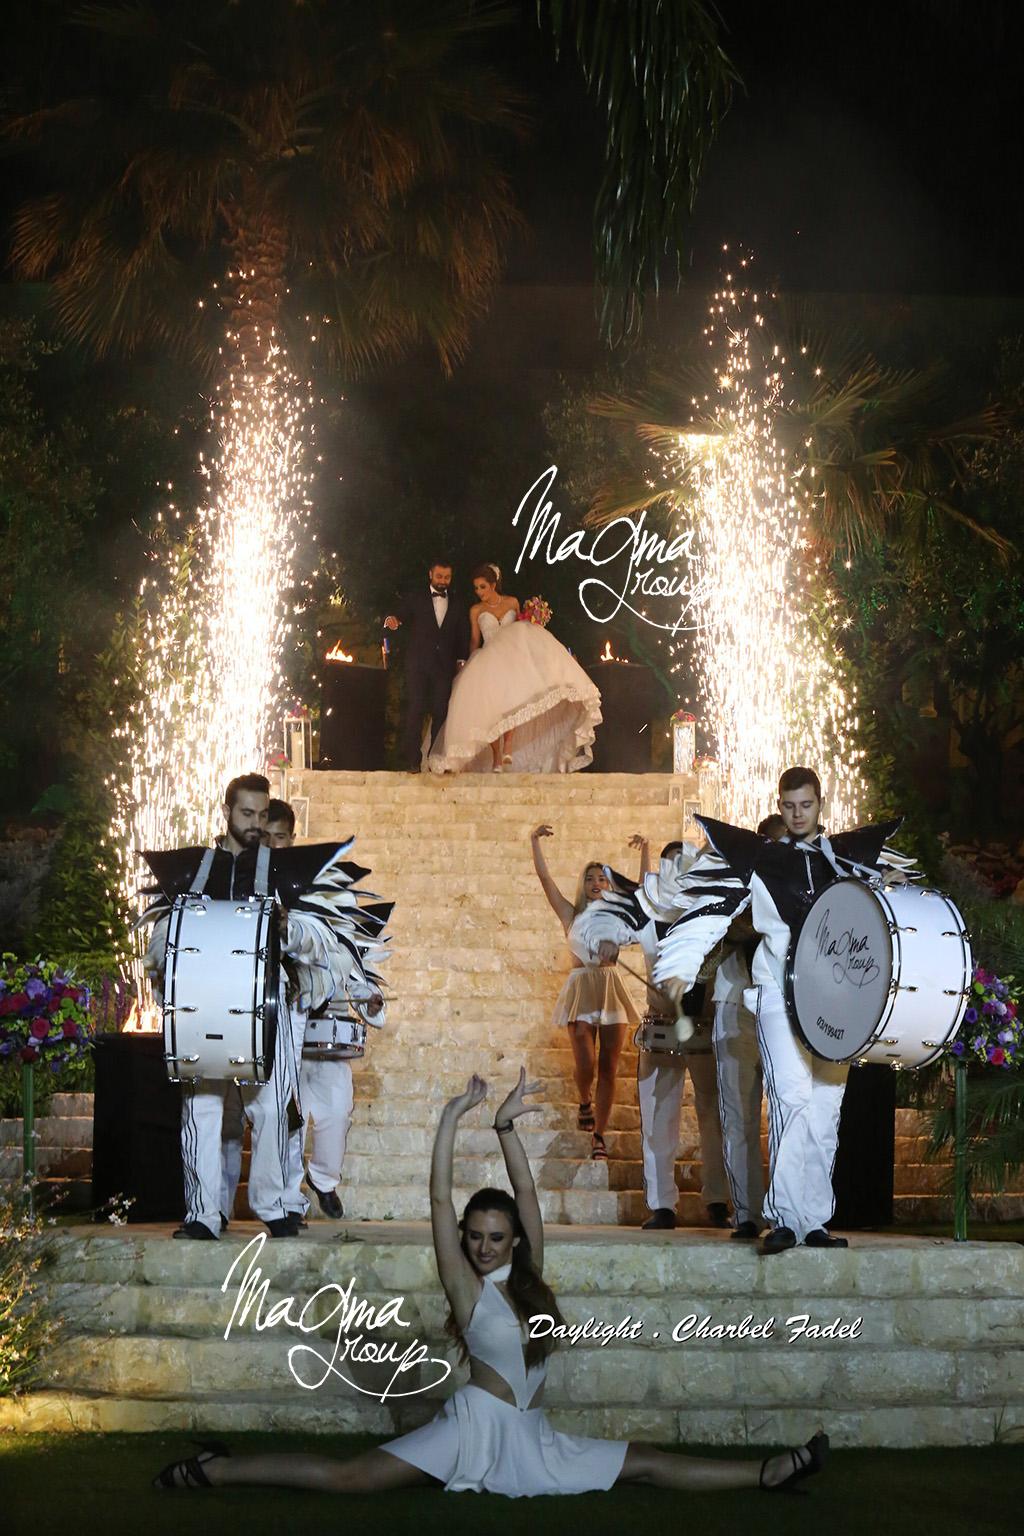 magma-group-wedding-parade-acrobat